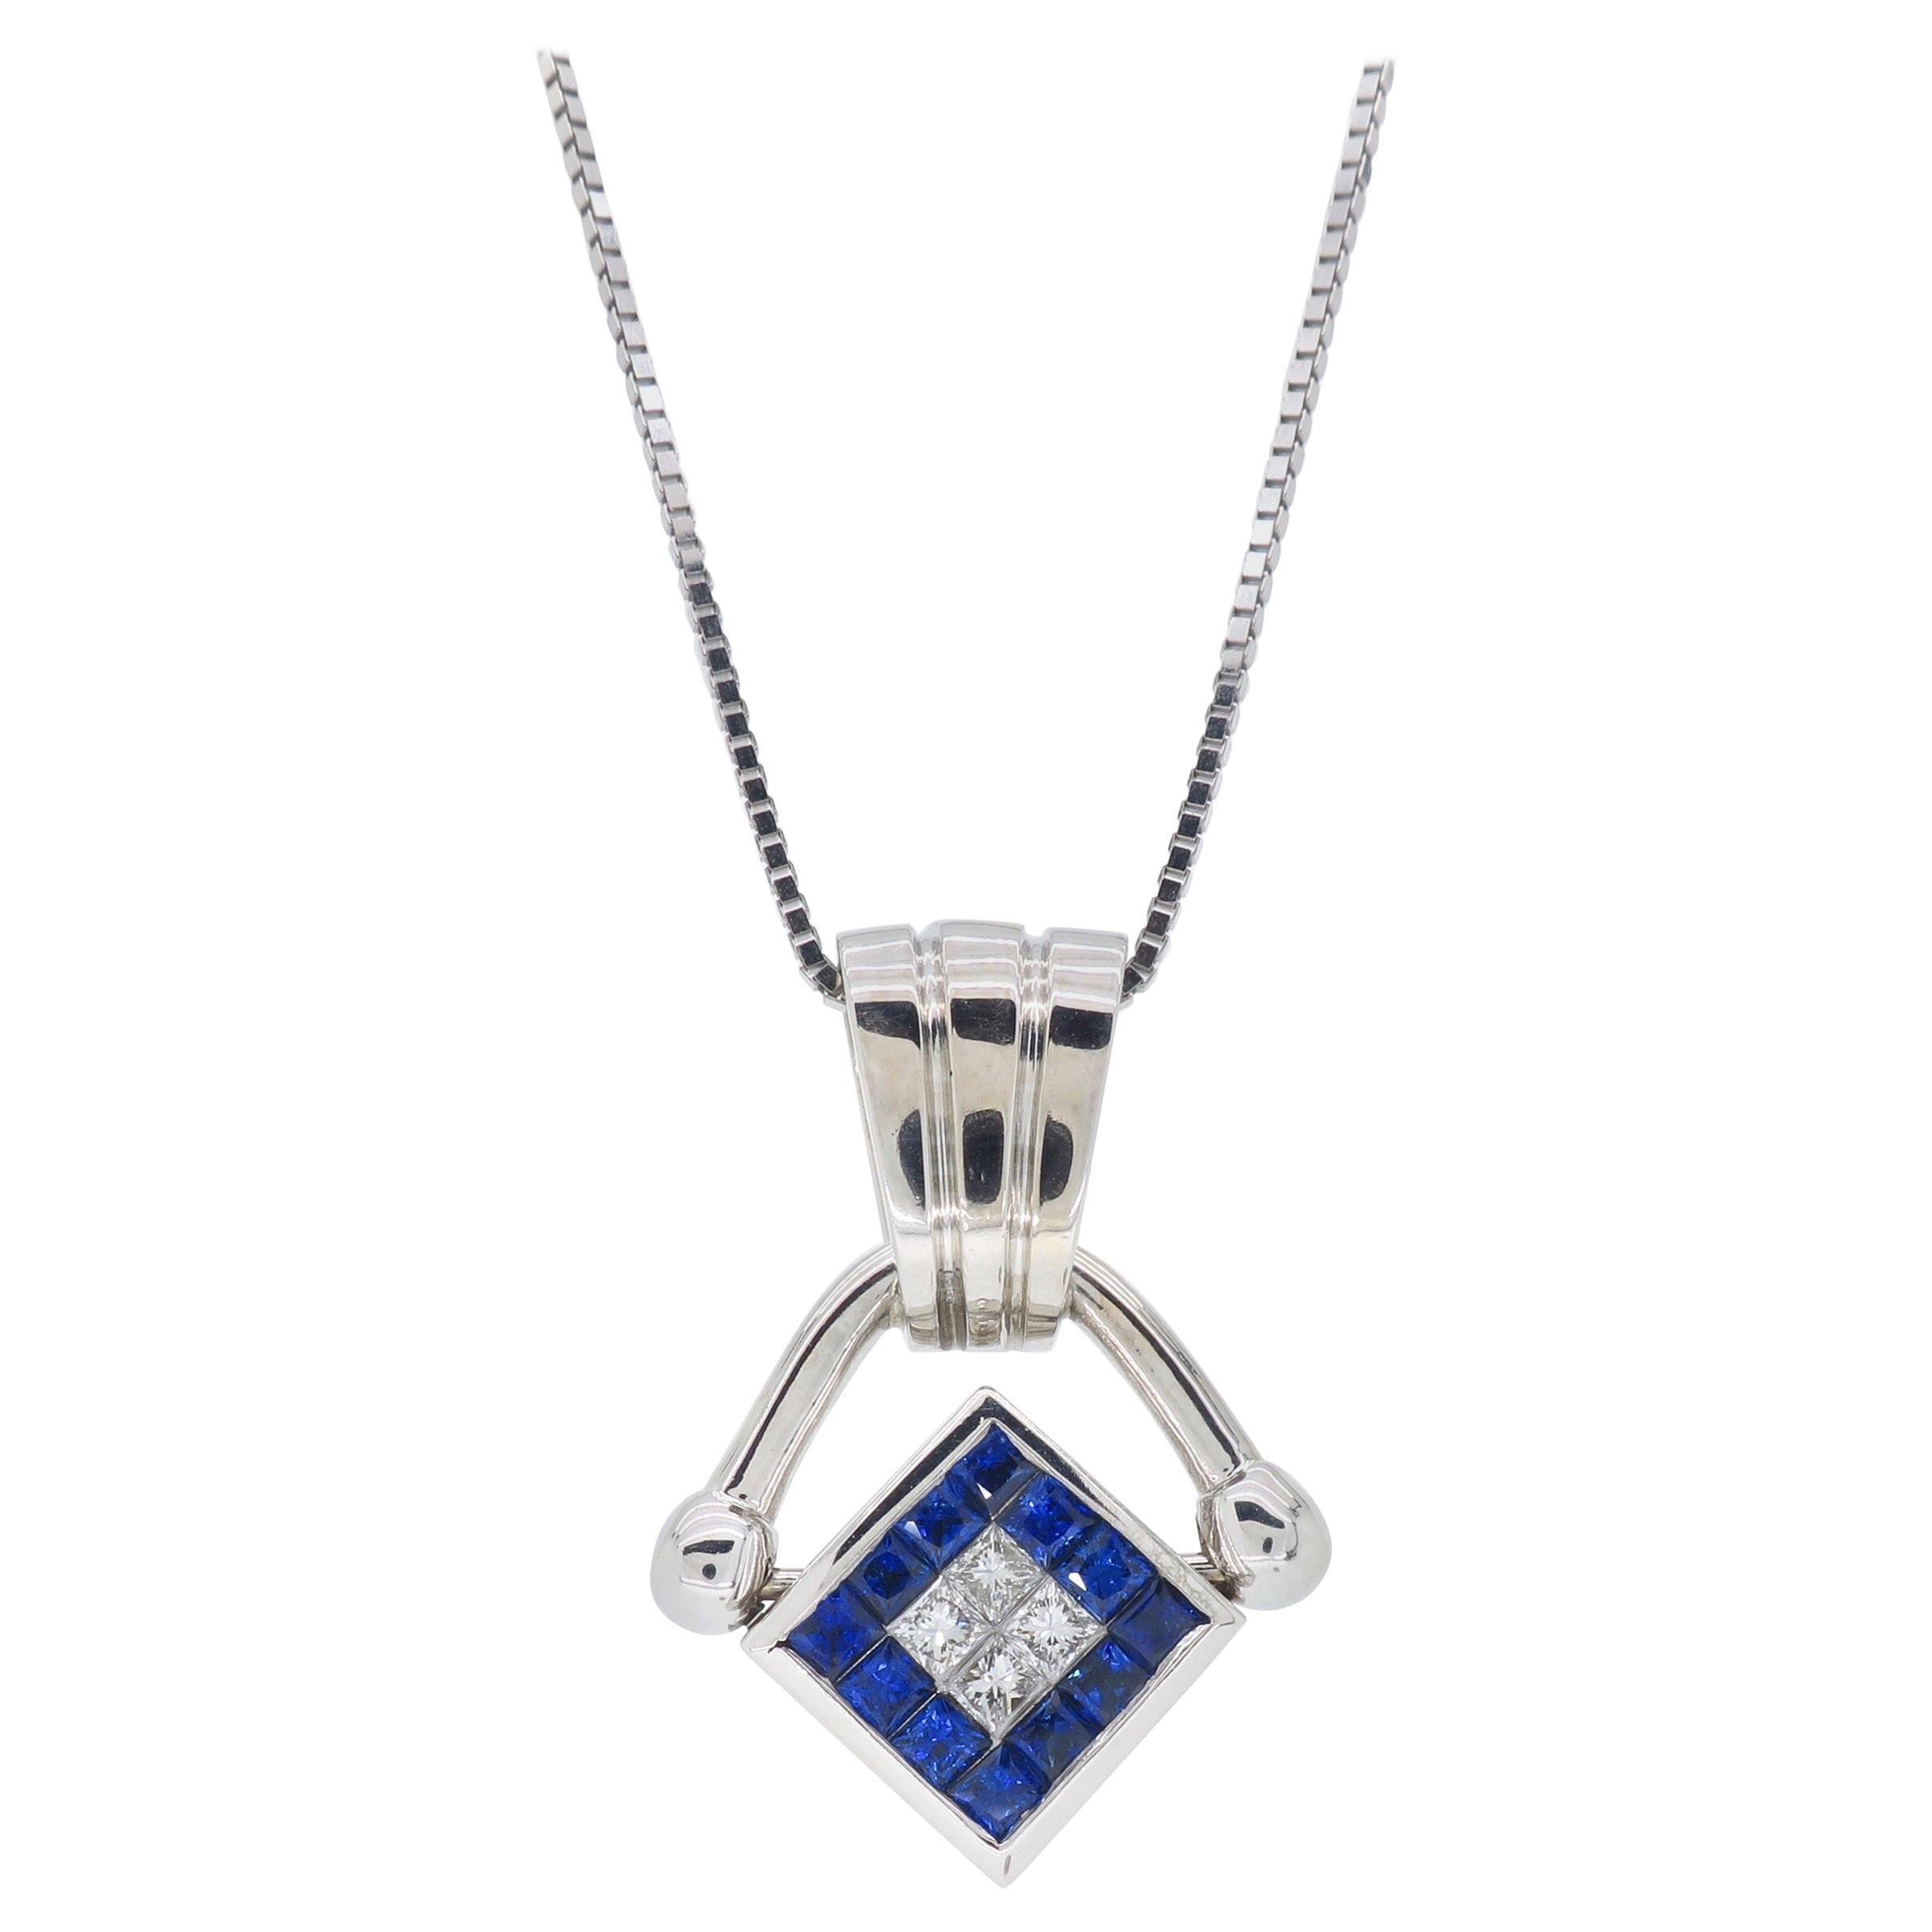 Reversible Diamond and Blue Sapphire Pendant Necklace